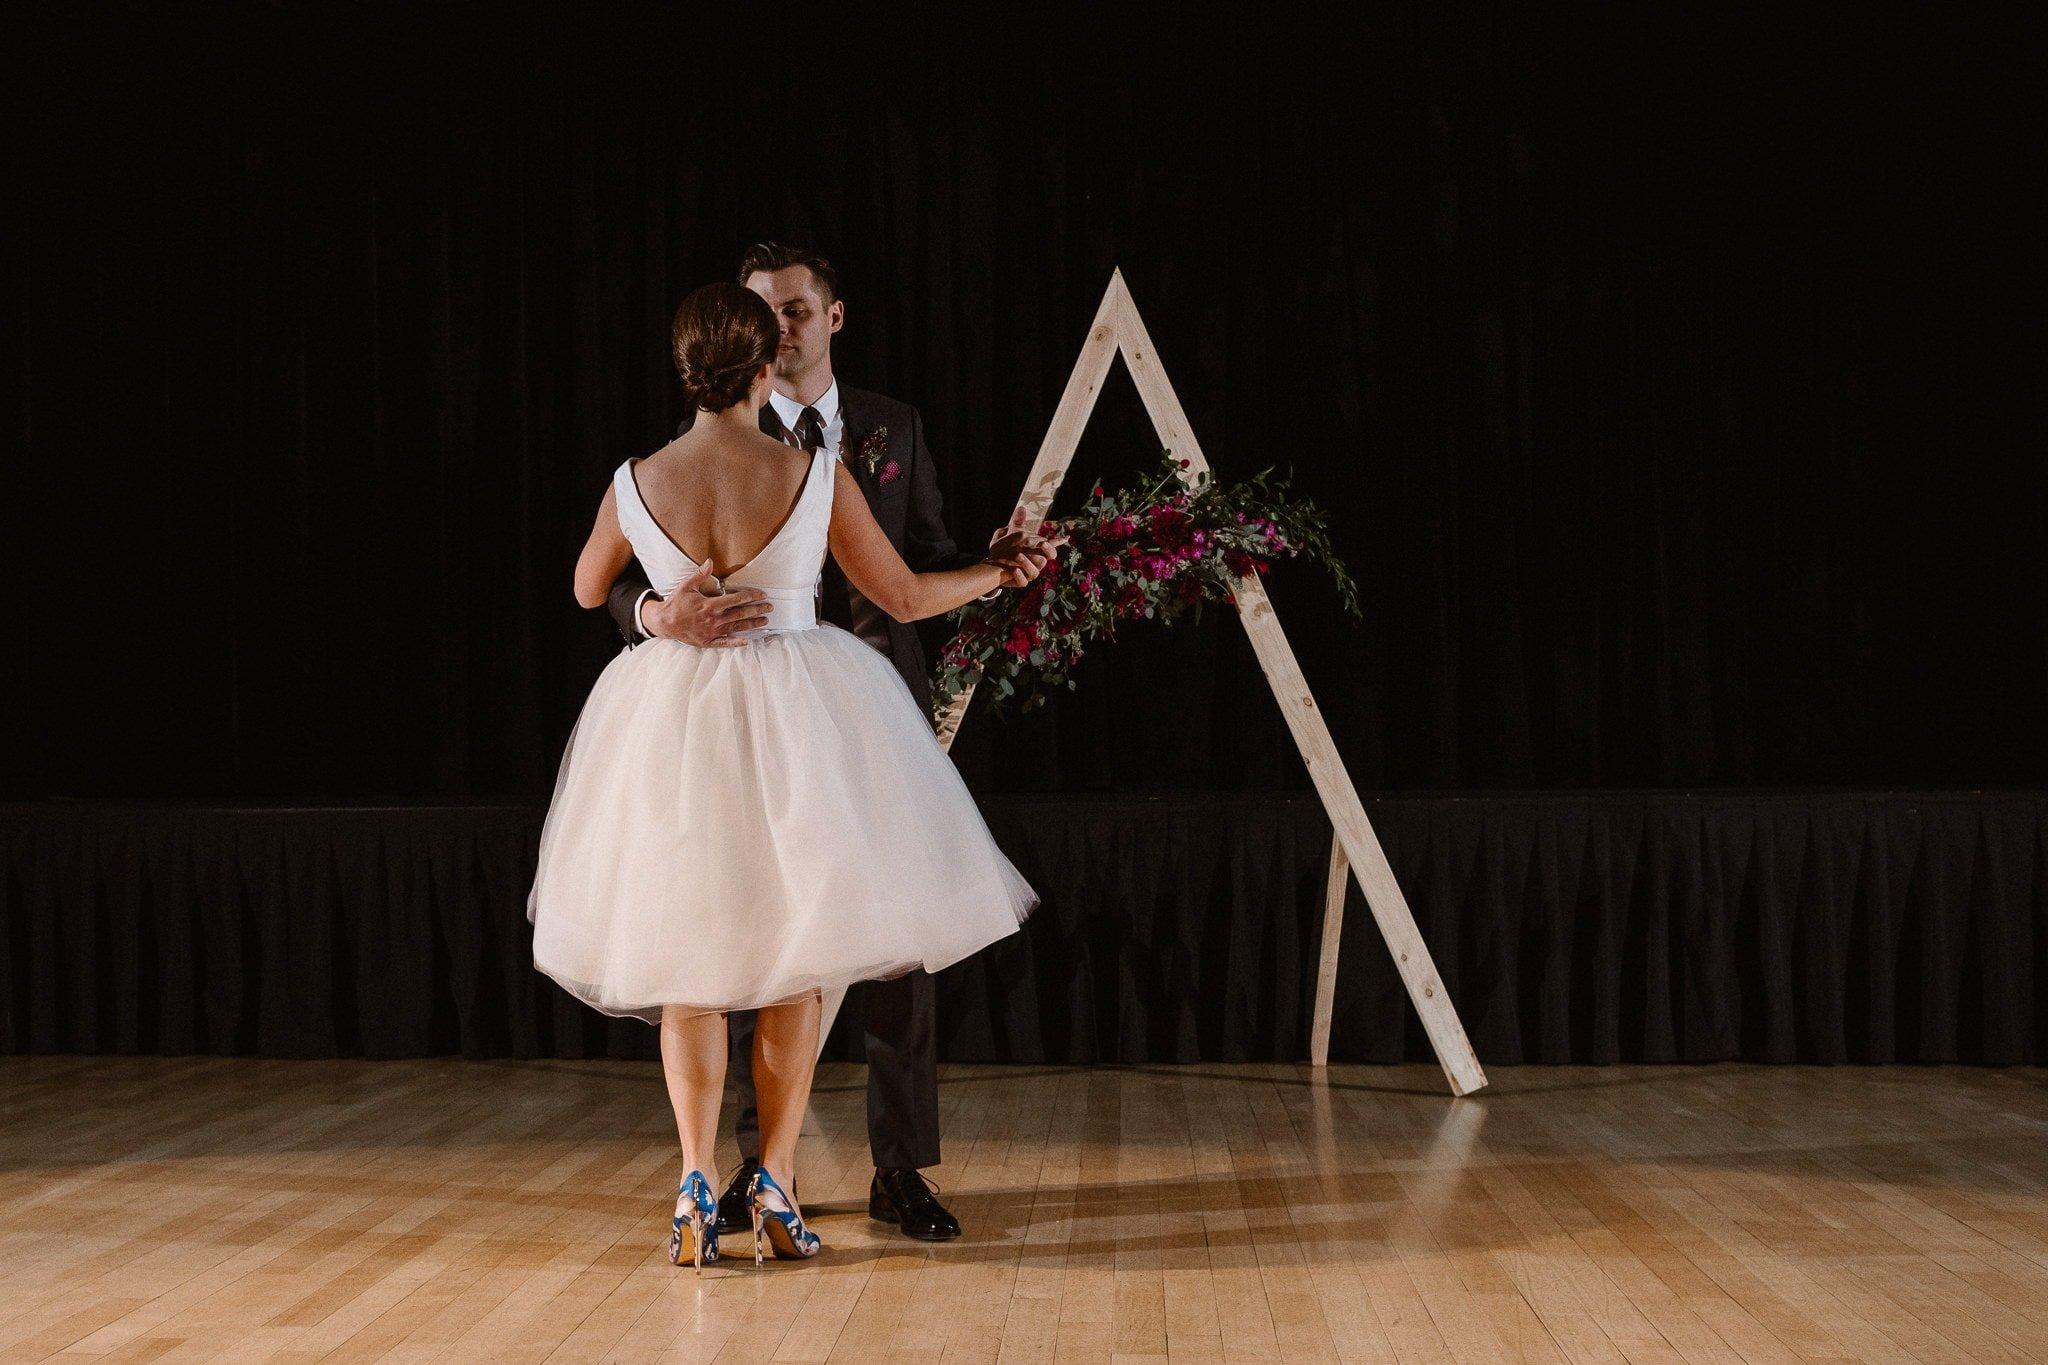 Silverthorne Pavilion wedding photography, Colorado wedding photographer, bride and groom first dance